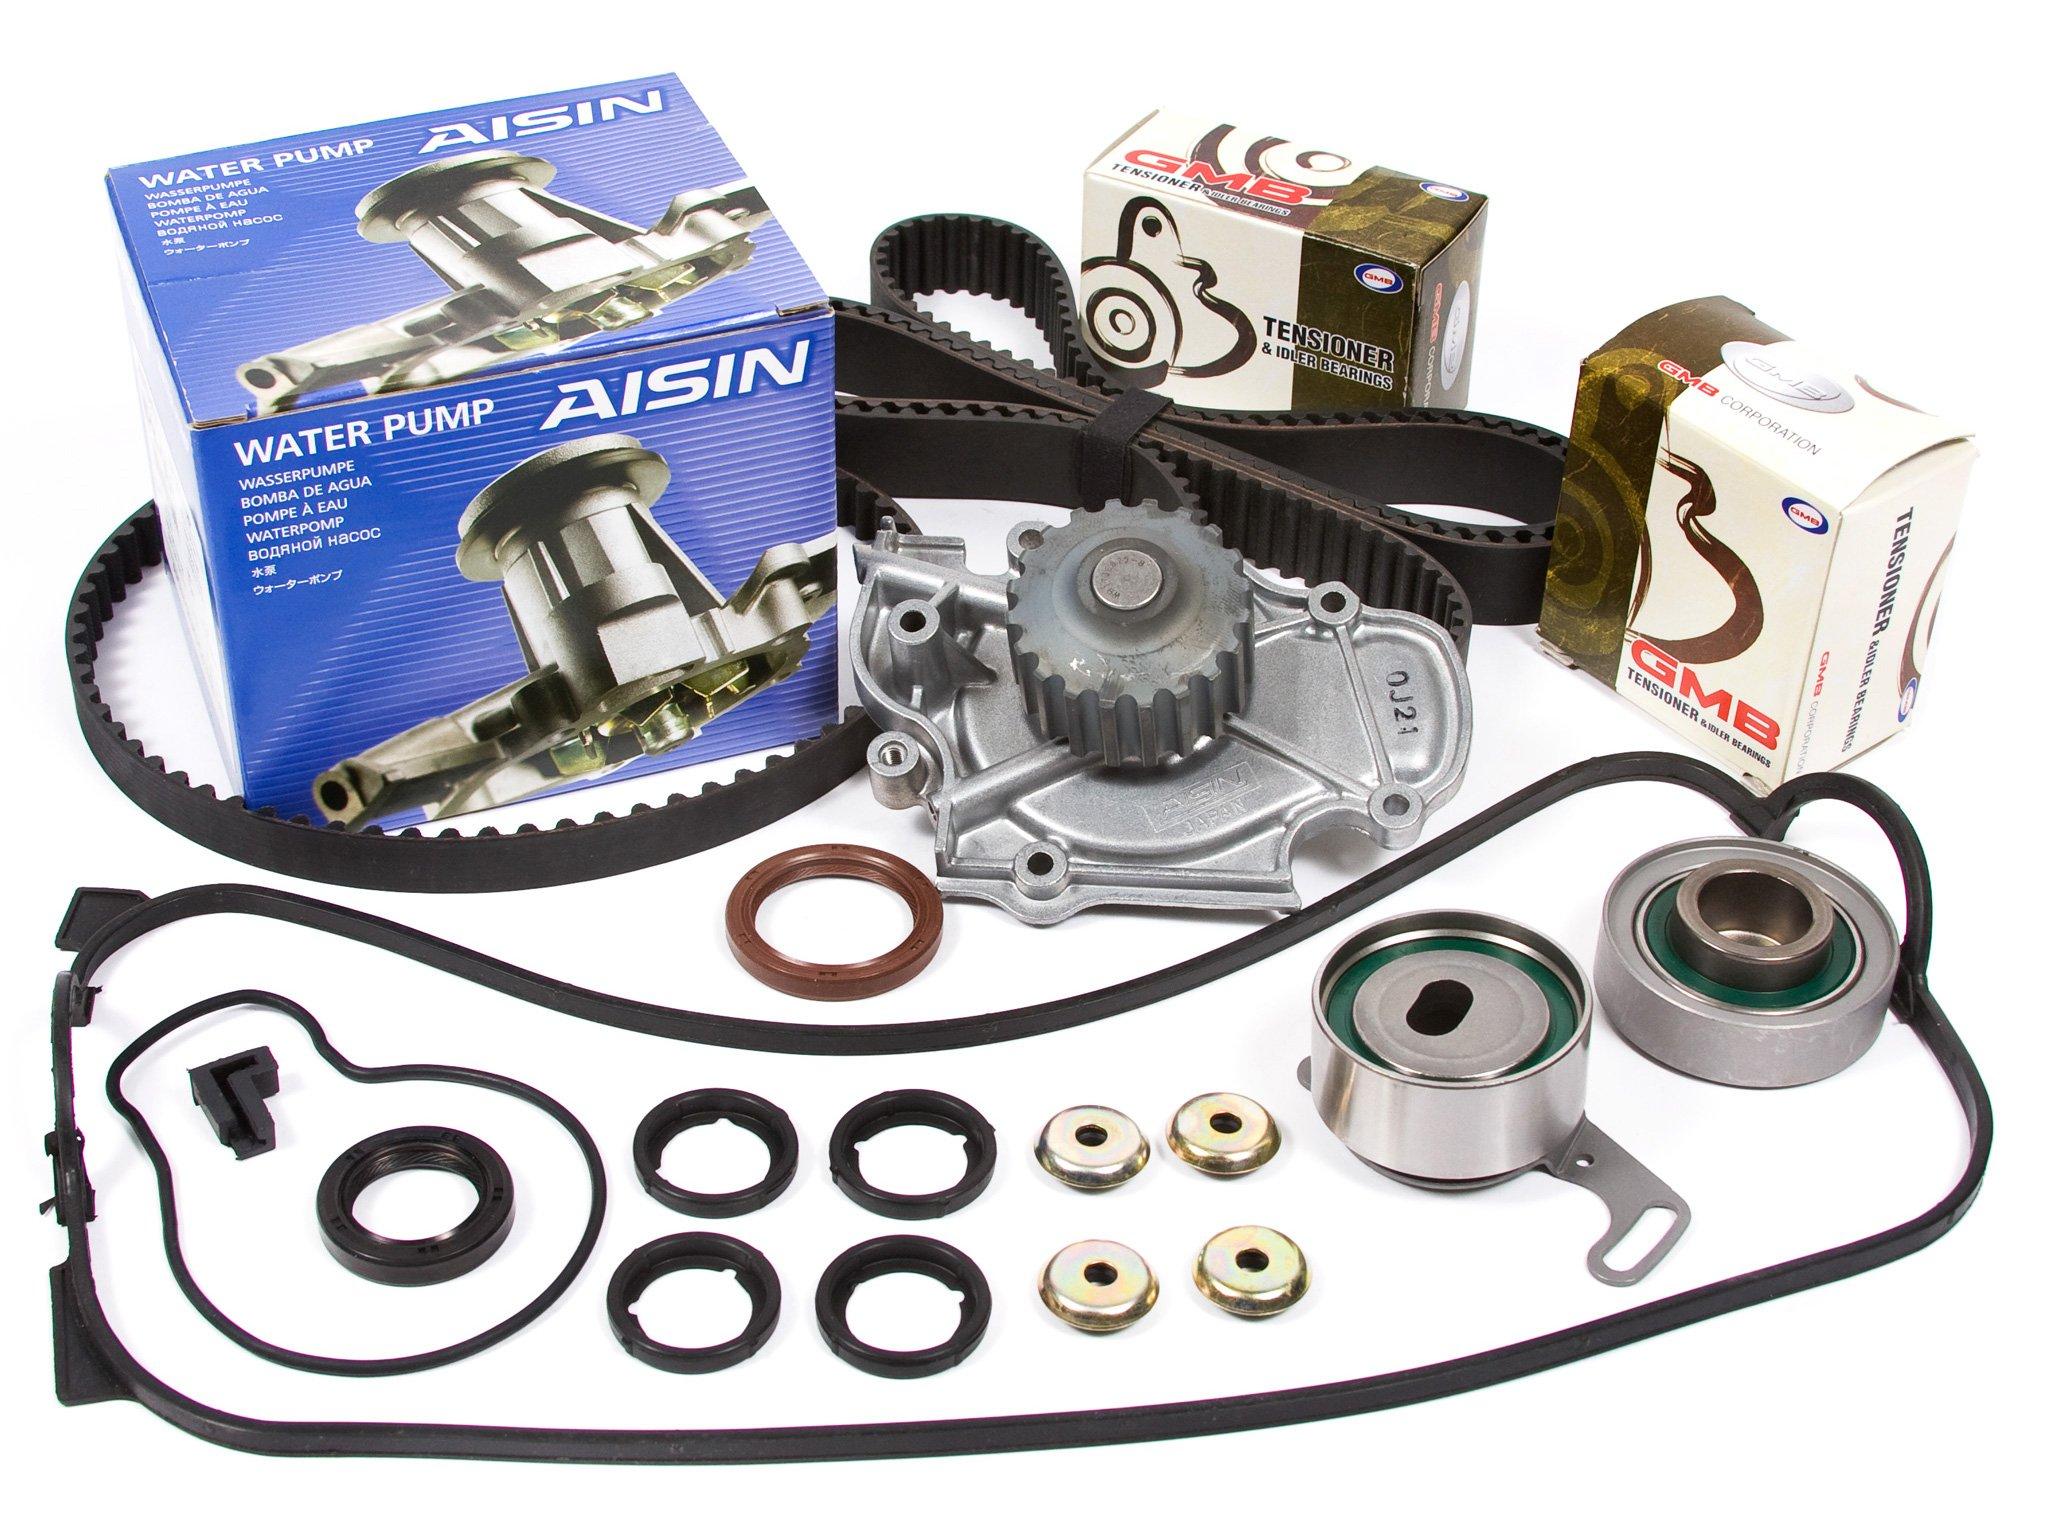 Evergreen TBK187VCN Fits 90-97 2.2L Honda Accord Odyssey Isuzu F22A F22B Timing Belt Kit Valve Cover Gasket NPW Water Pump